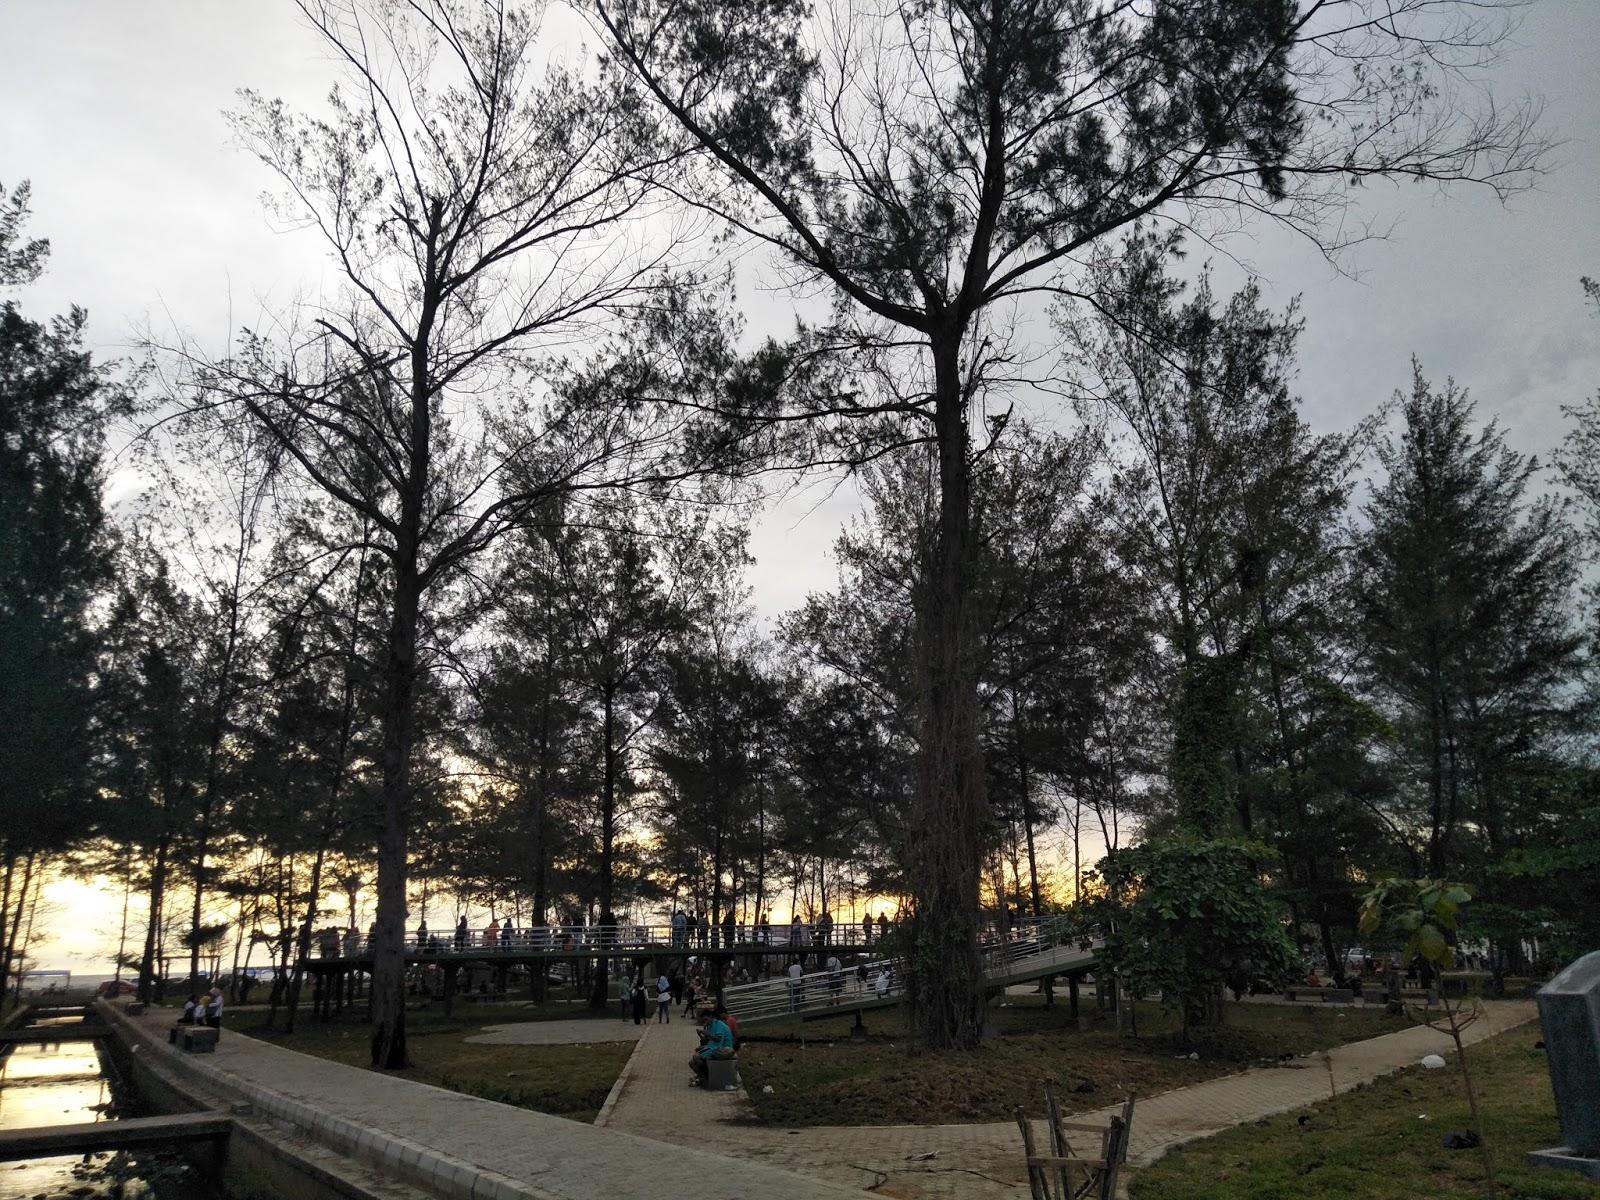 Taman Hijau Berkas Provinsi Bengkulu Pantai Kota